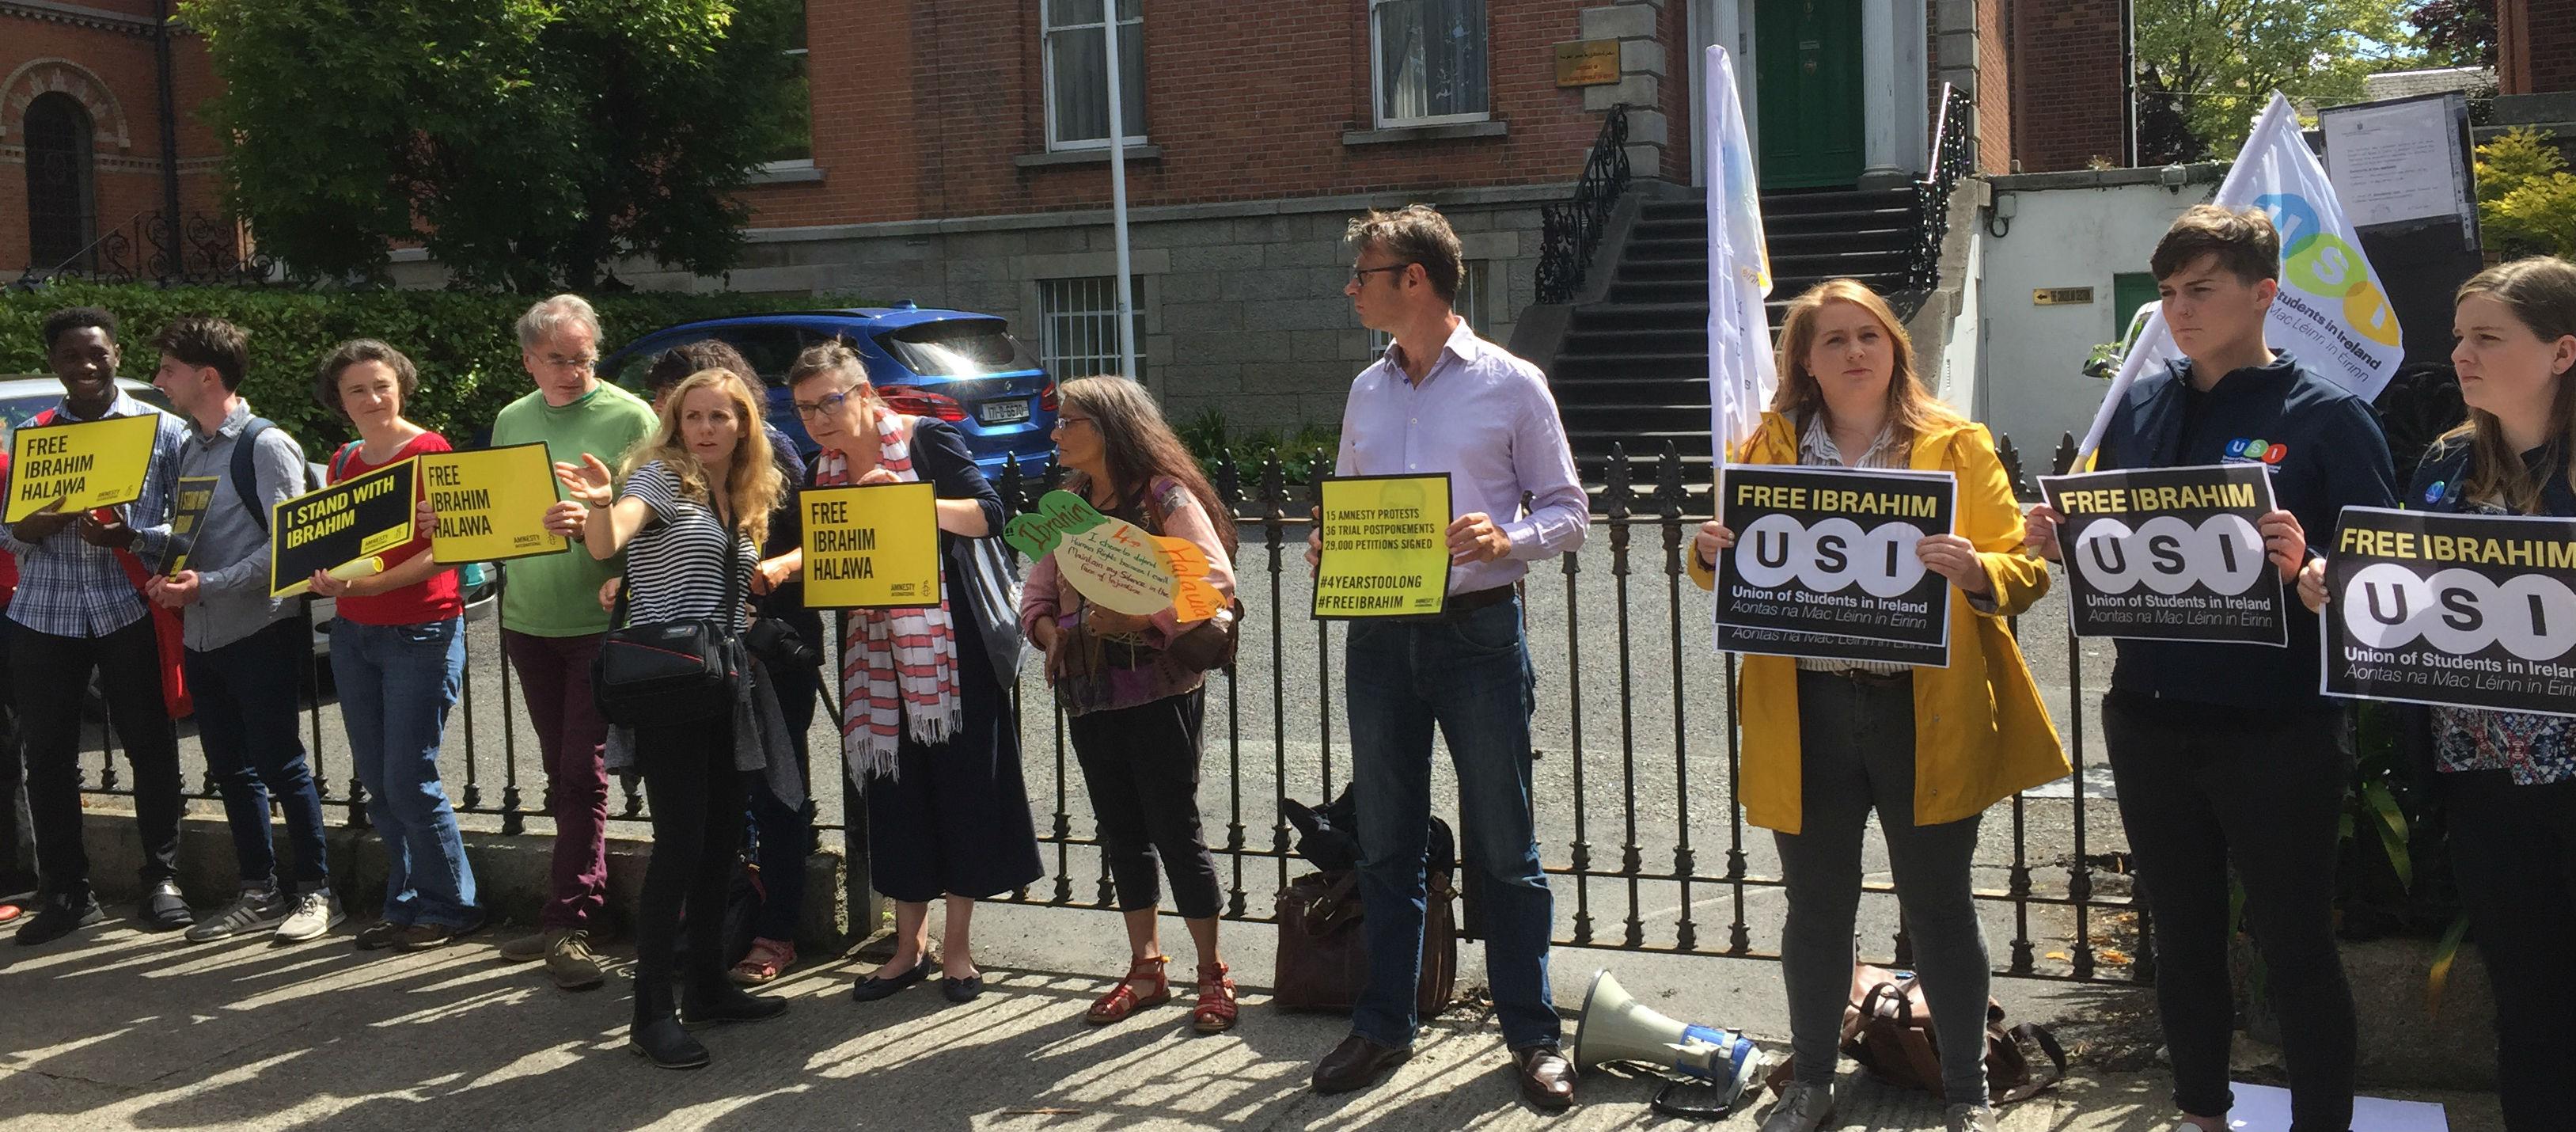 Halawa Supporters Meet Outside Egyptian Embassy